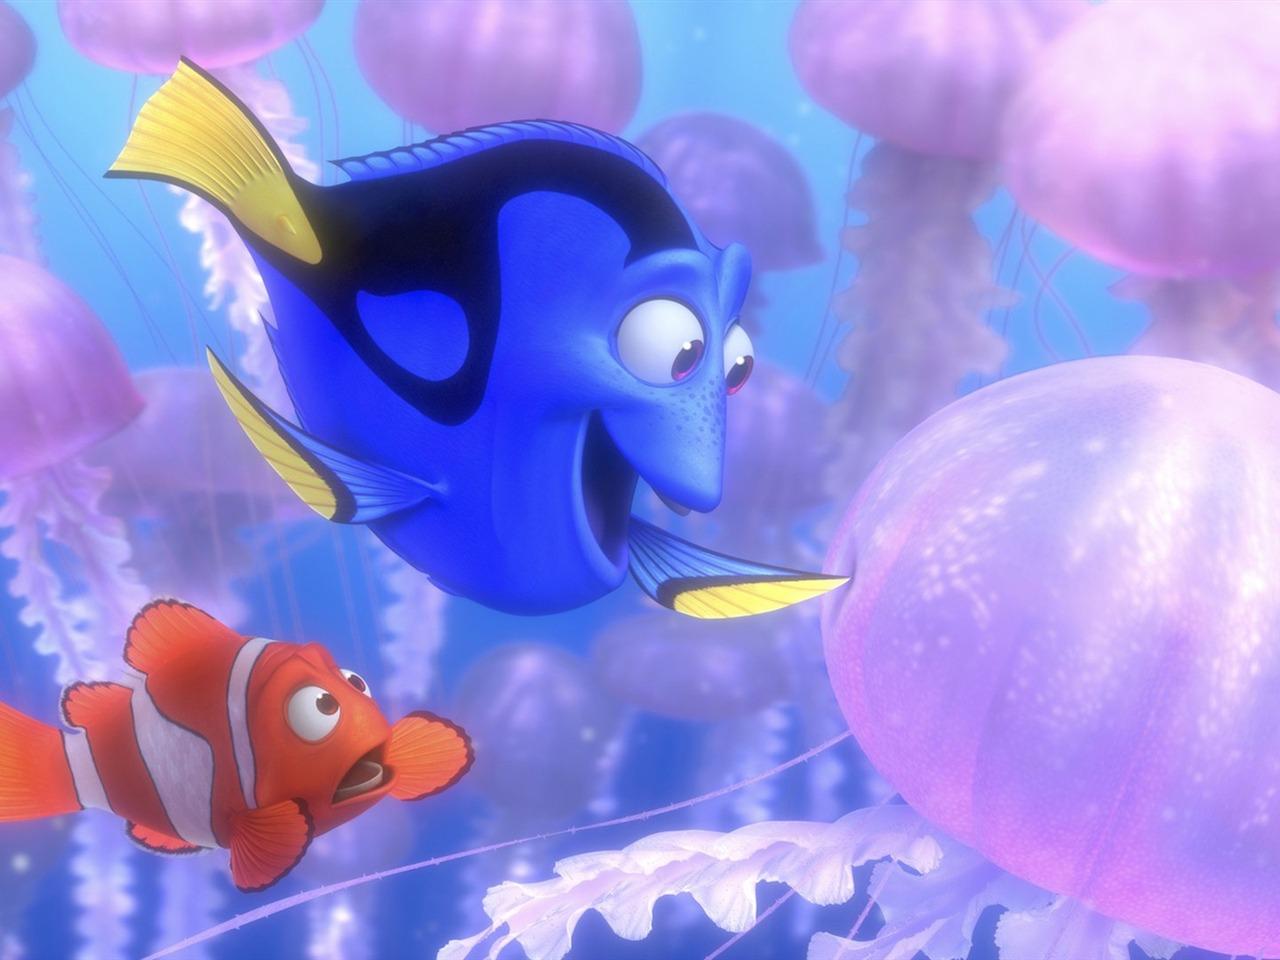 Finding Nemo D Animasi Hd Wallpaper: Nemo 3D 영화 HD 데스크탑 벽지 02 찾기시사